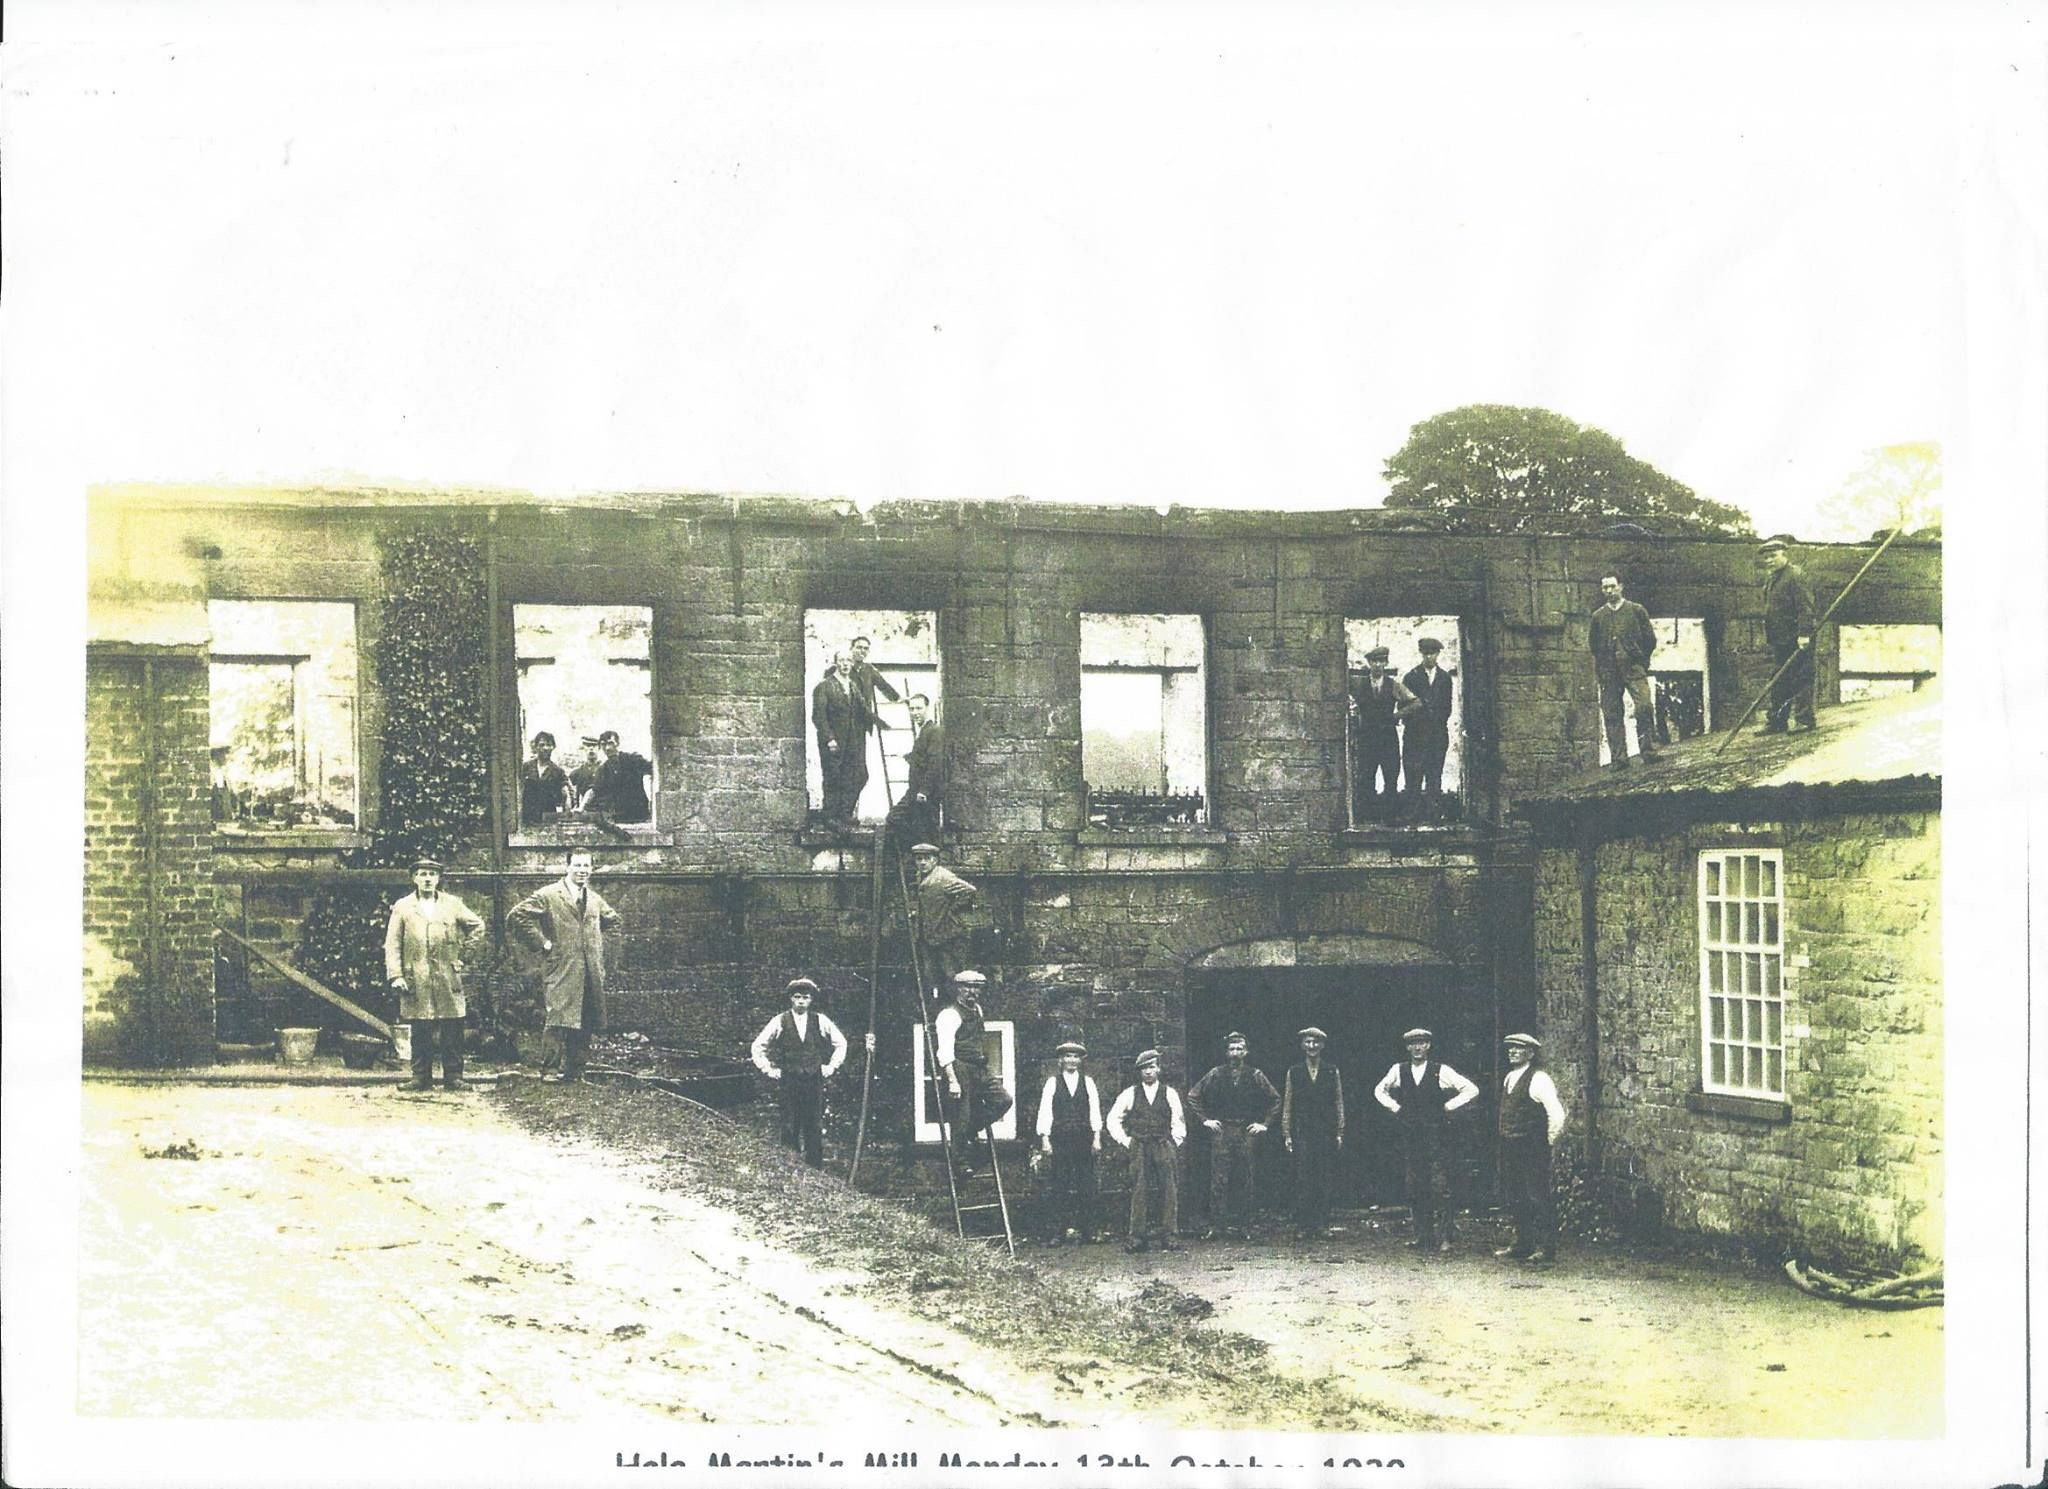 Hale Martins Mill - Milltown - Dungannon